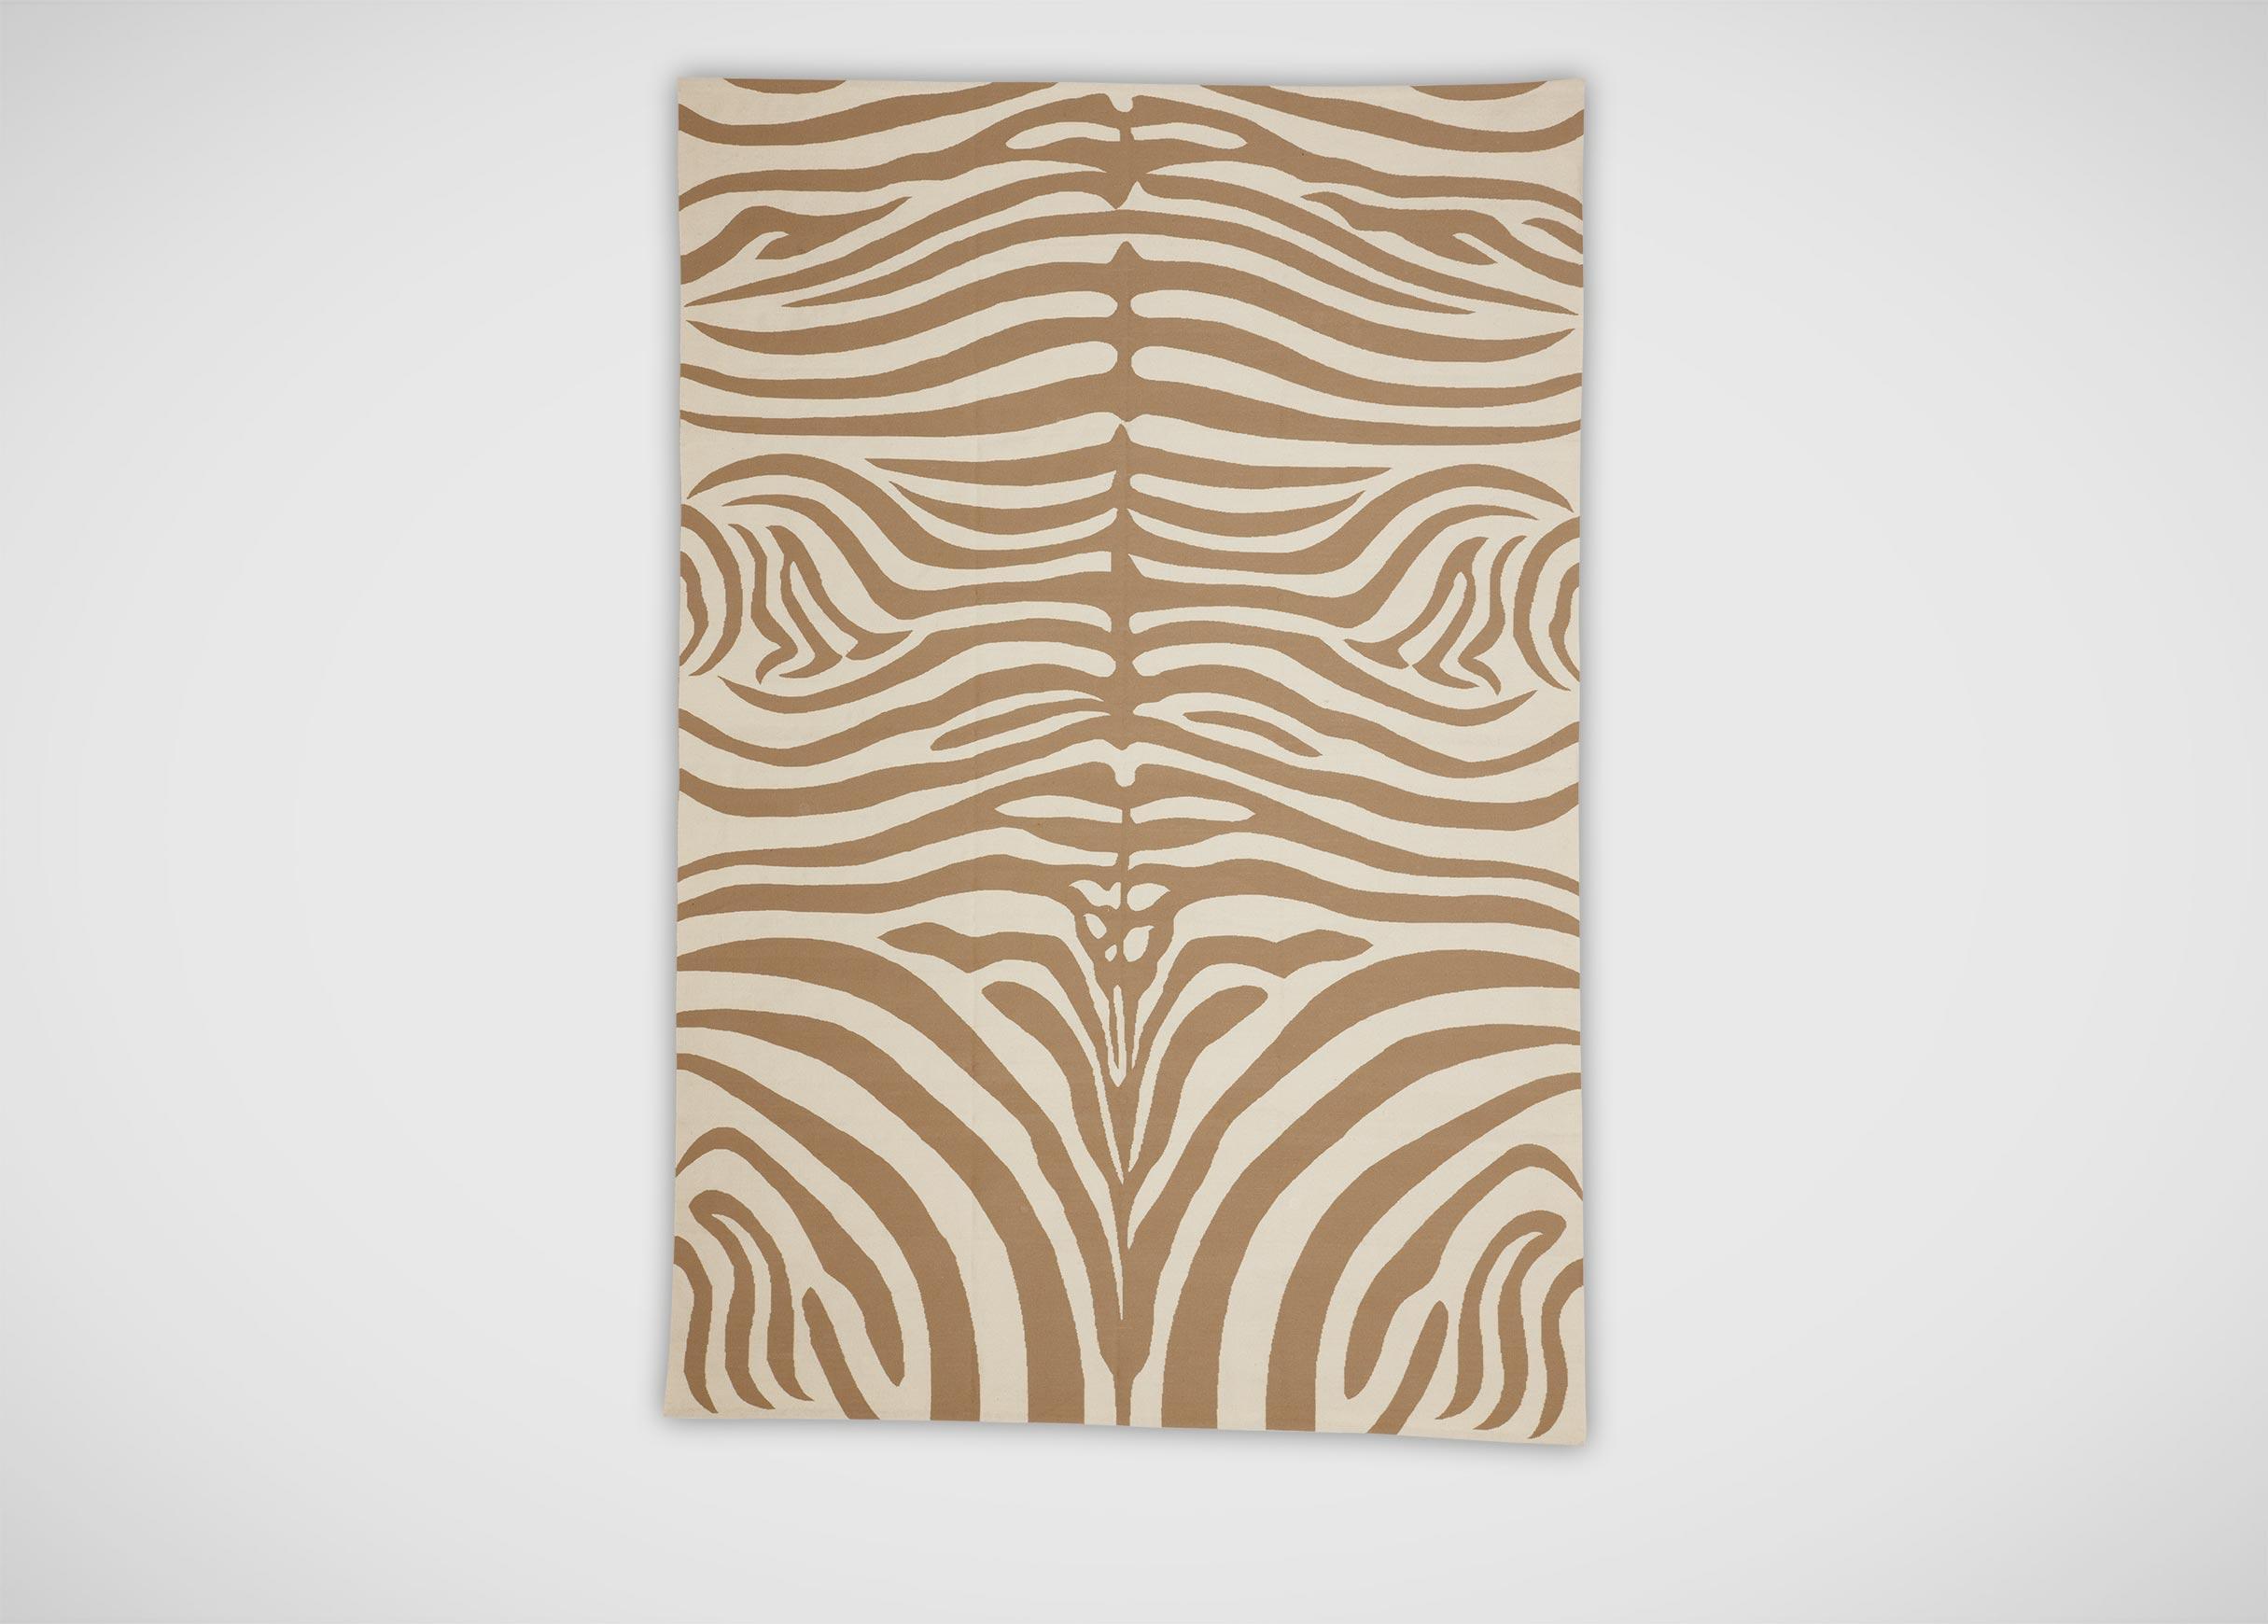 clara x wool overstock area product shipping grand free rug today home bazaar zebra santa garden